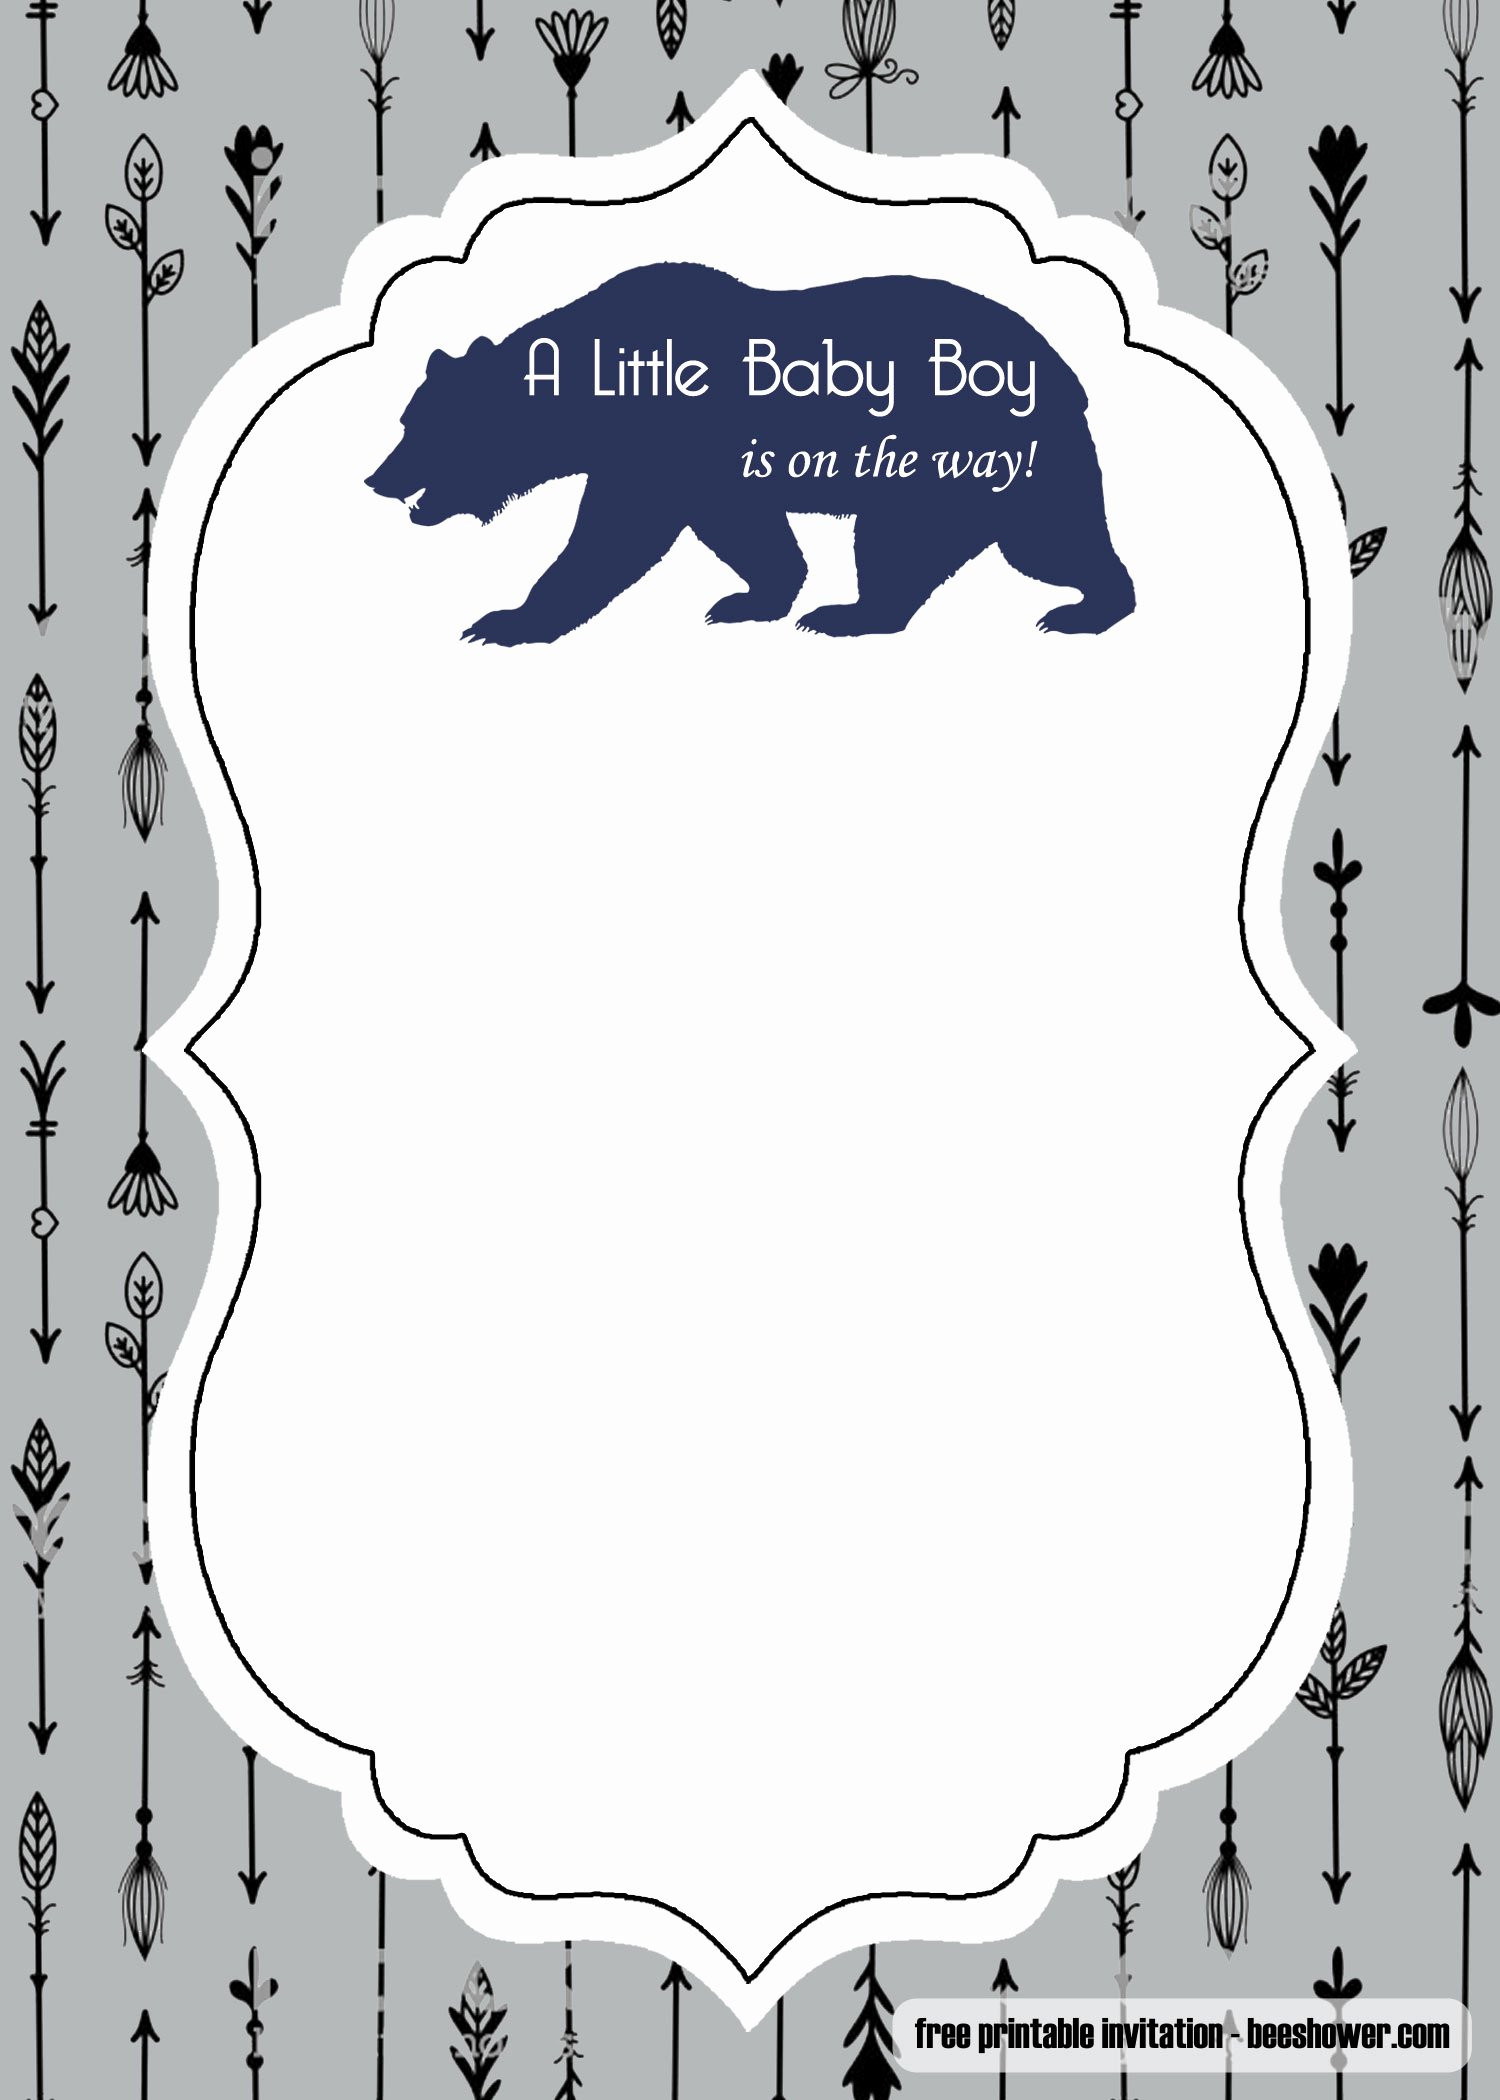 Baby Boy Invitation Template Fresh Free Adventure Awaits Baby Shower Invitation Template